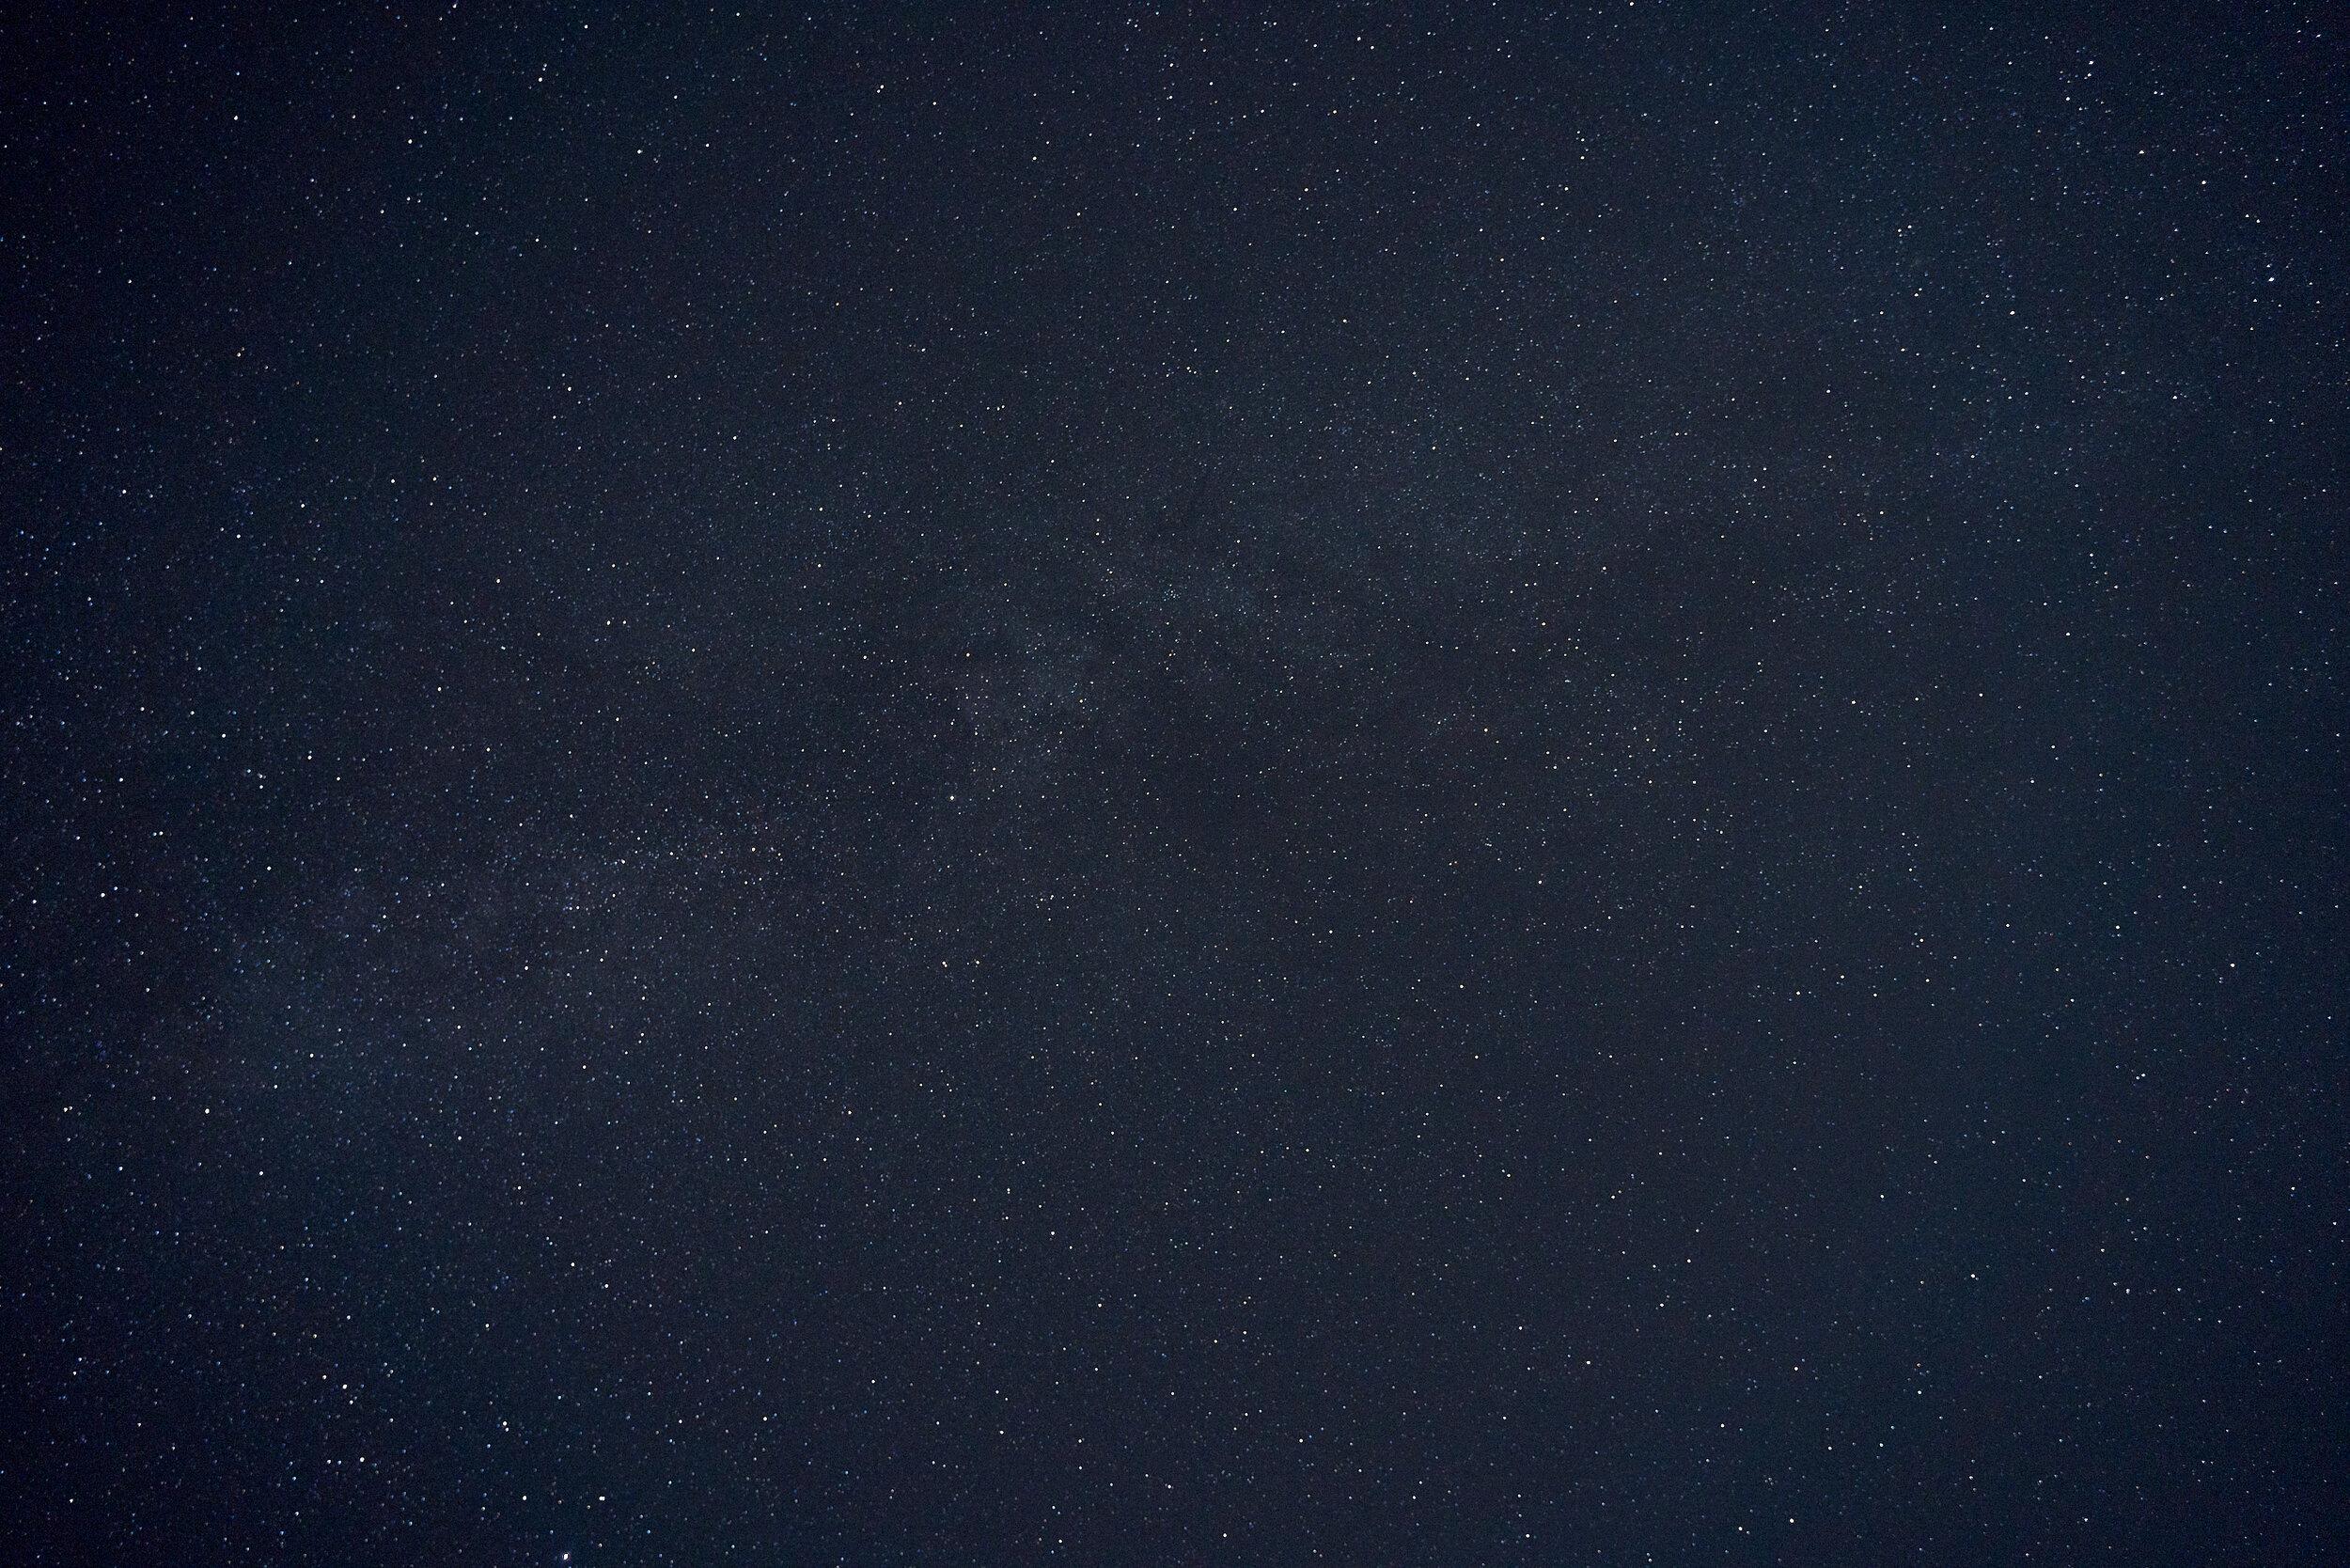 17.Shot with Hoya Starscape filter